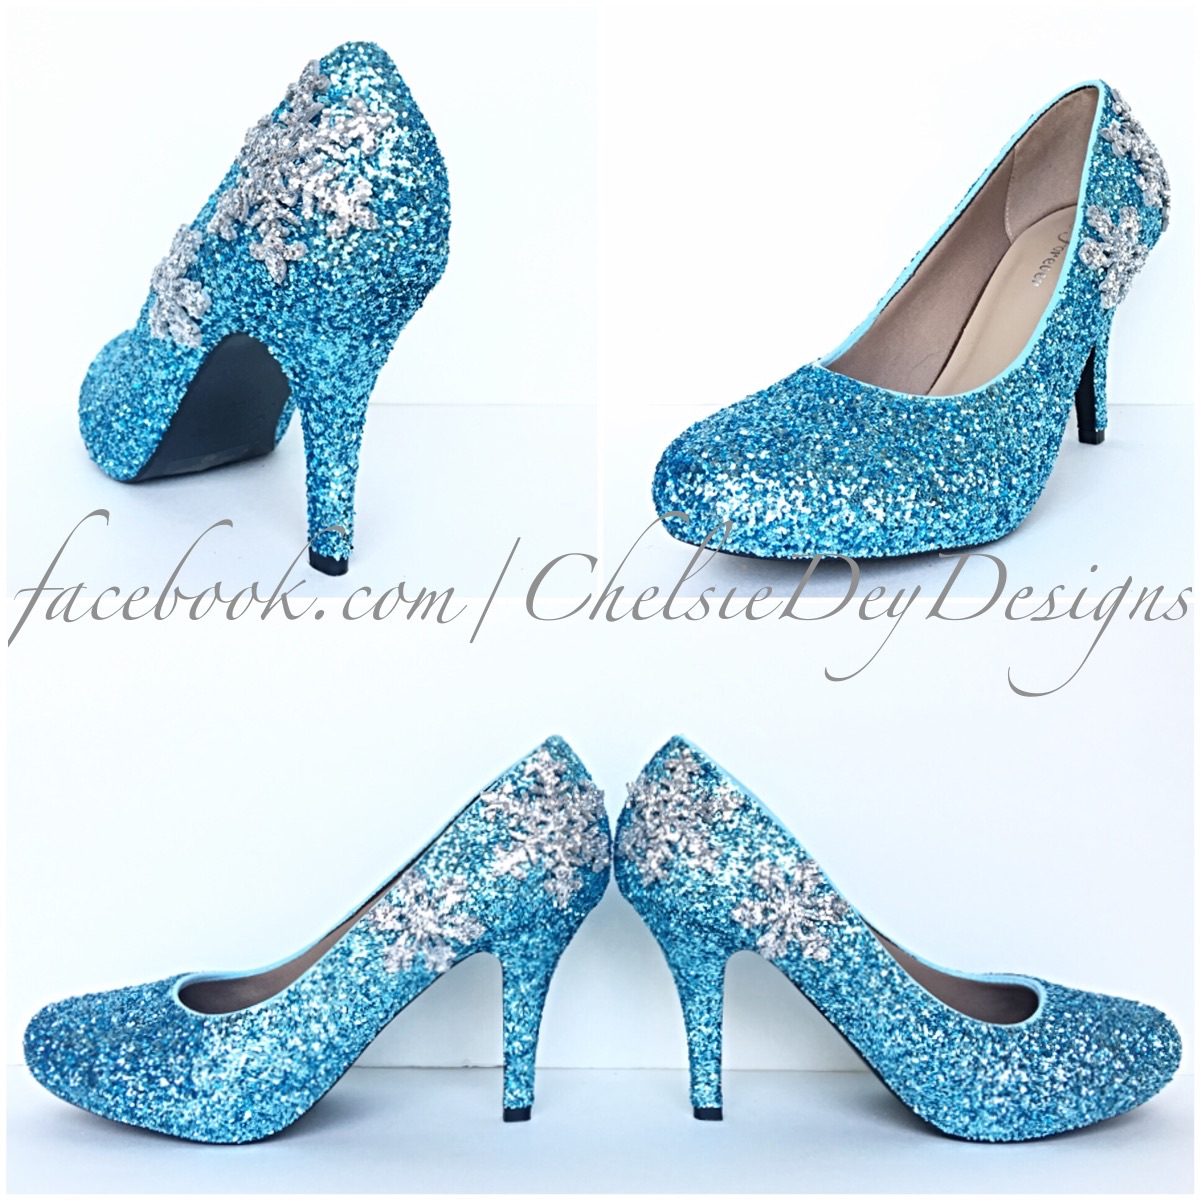 Aqua Glitter High Heels - Silver Snowflake Pumps -Blue Turquoise ...